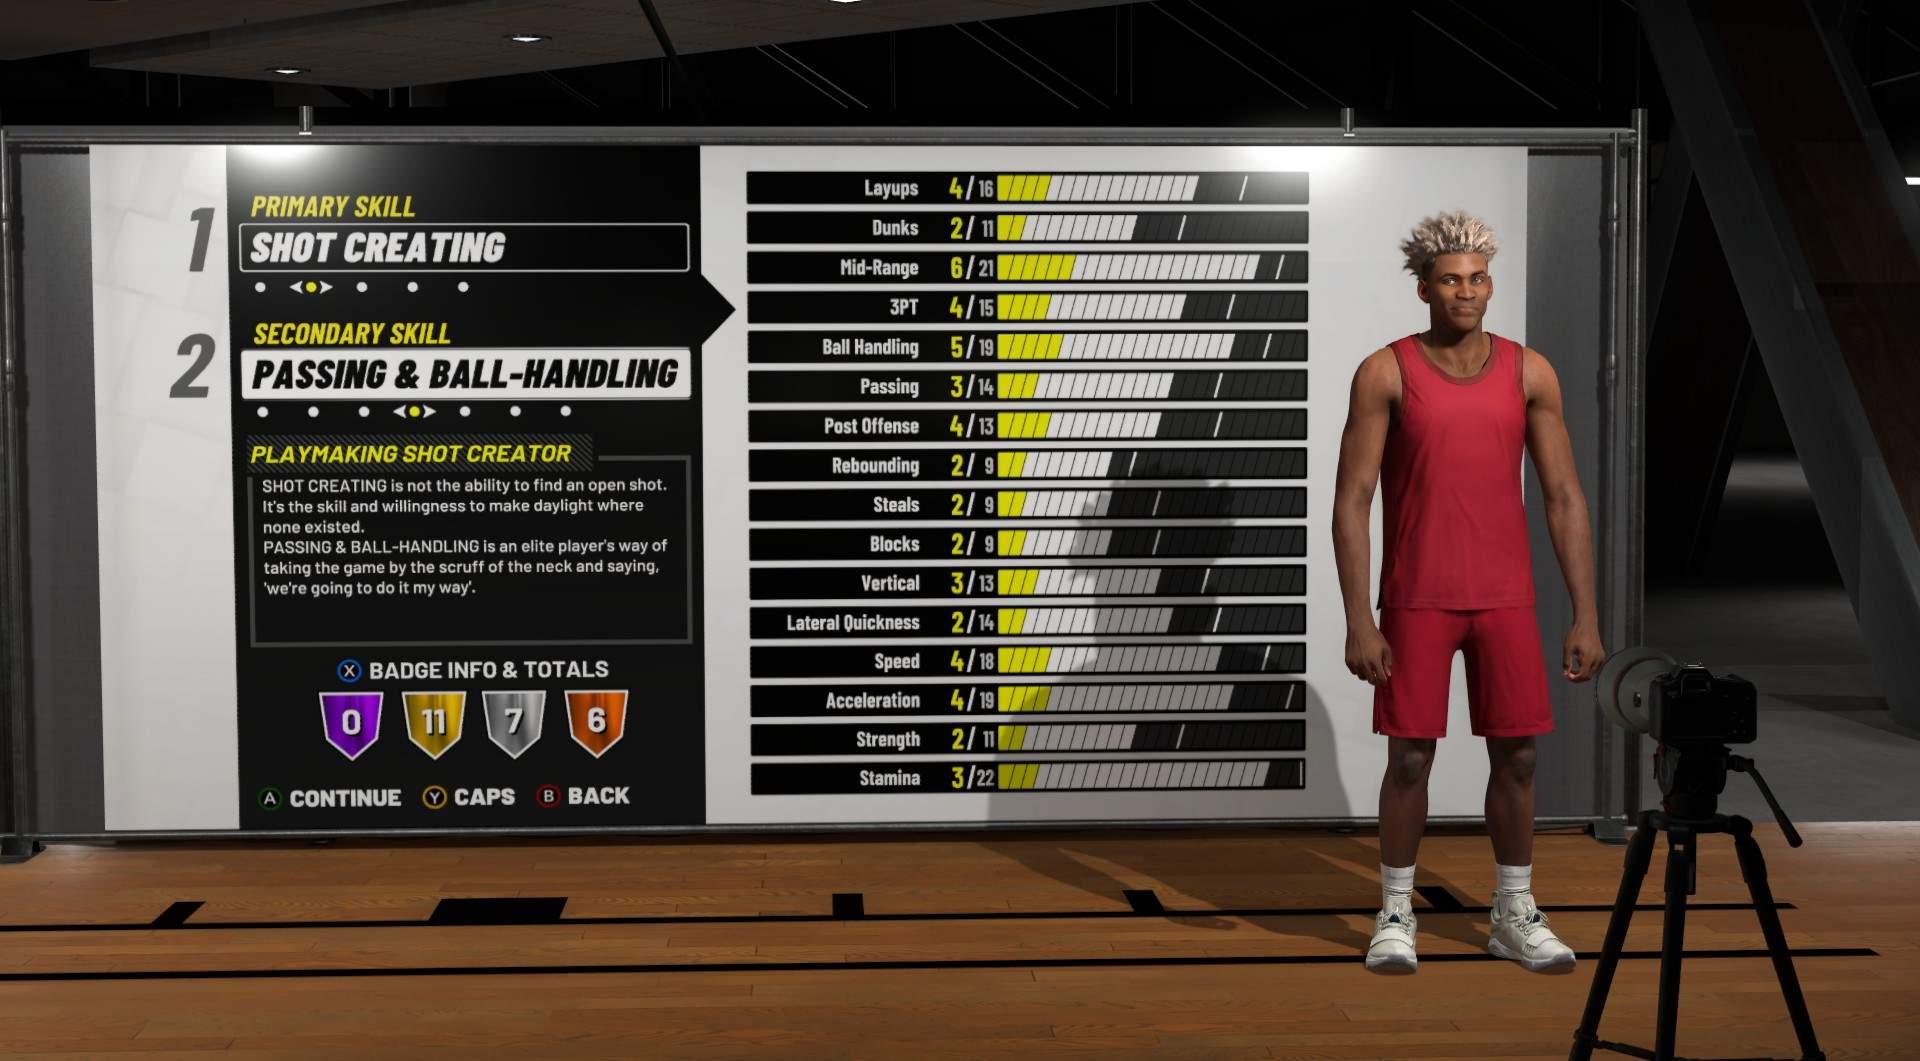 NBA 2K19 - Build Recommendations